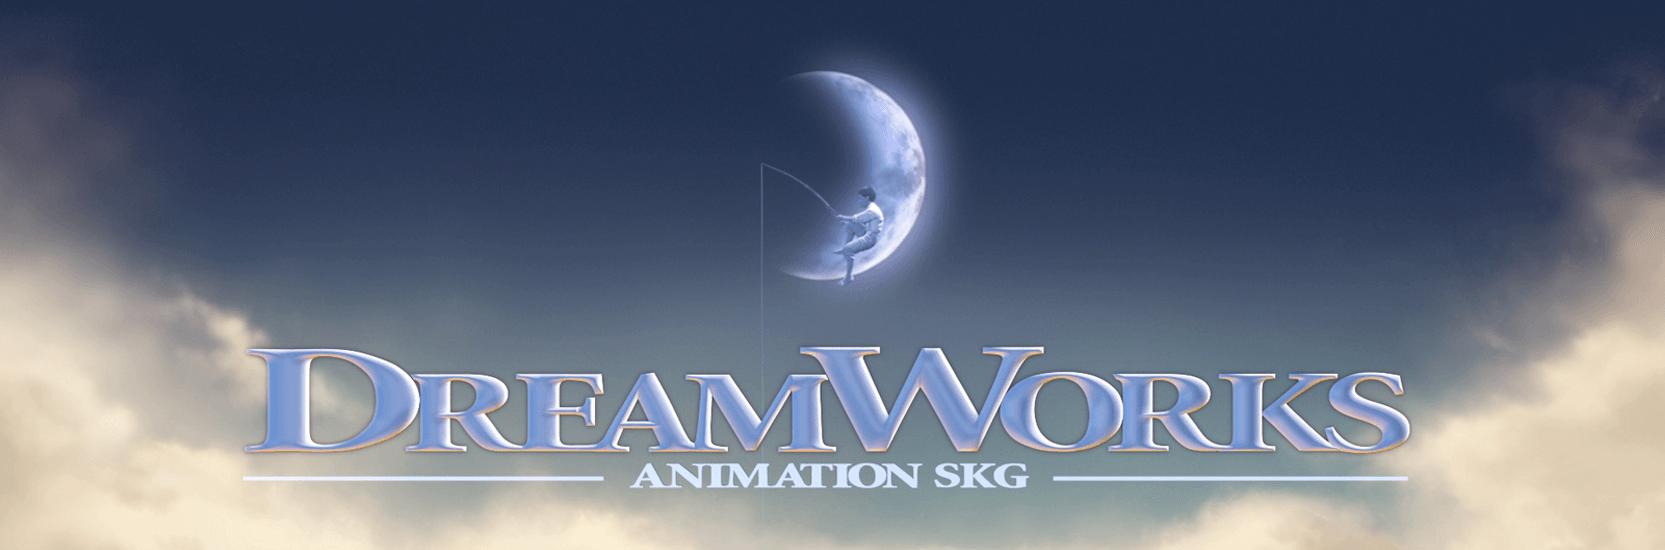 DreamWorks Animation : le line-up officiel